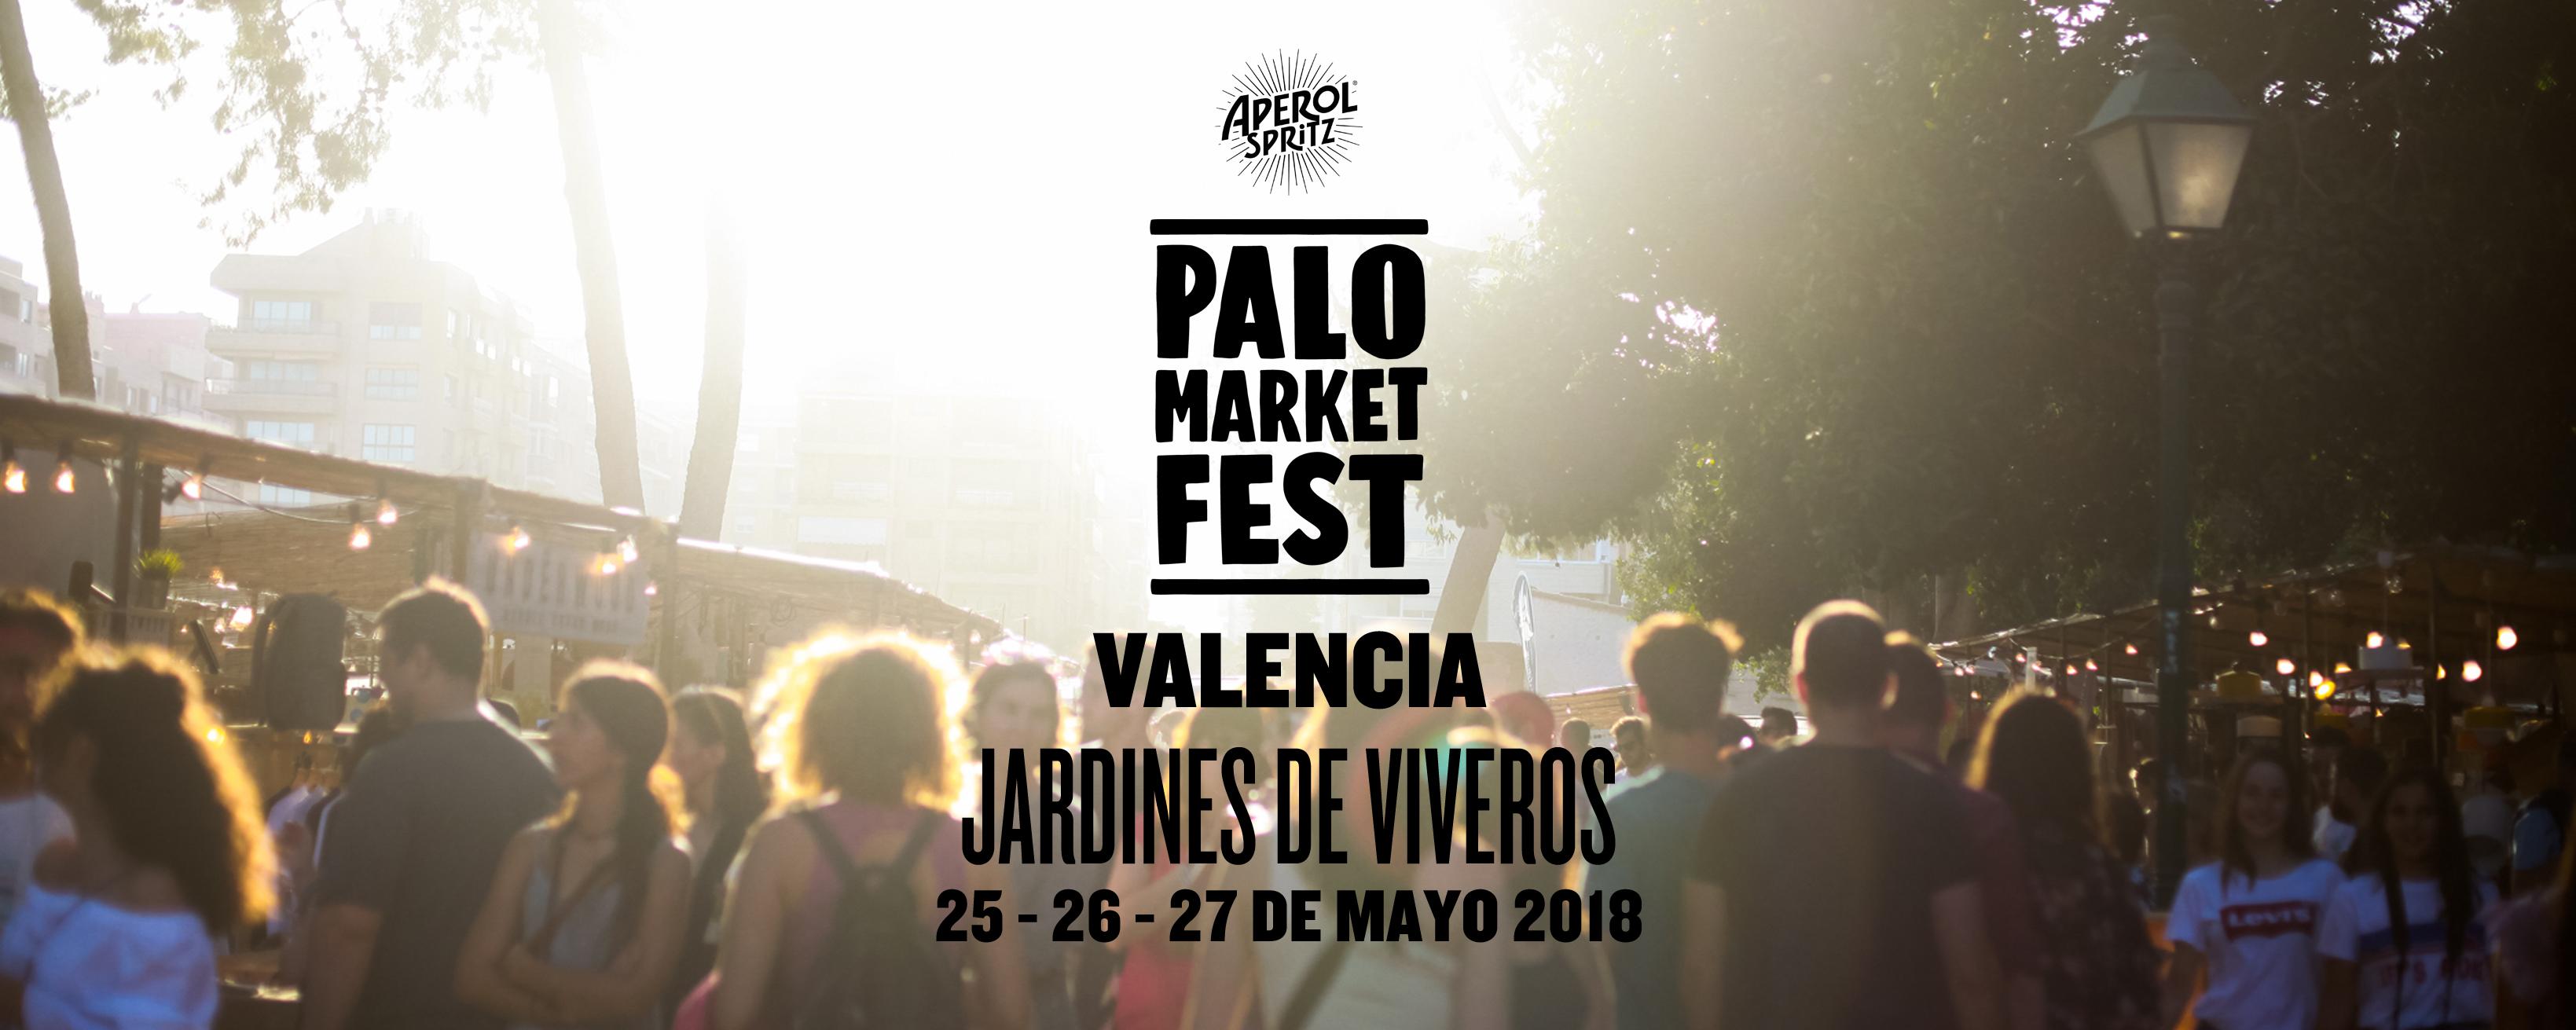 Palo Market Fest 2018 Valencia